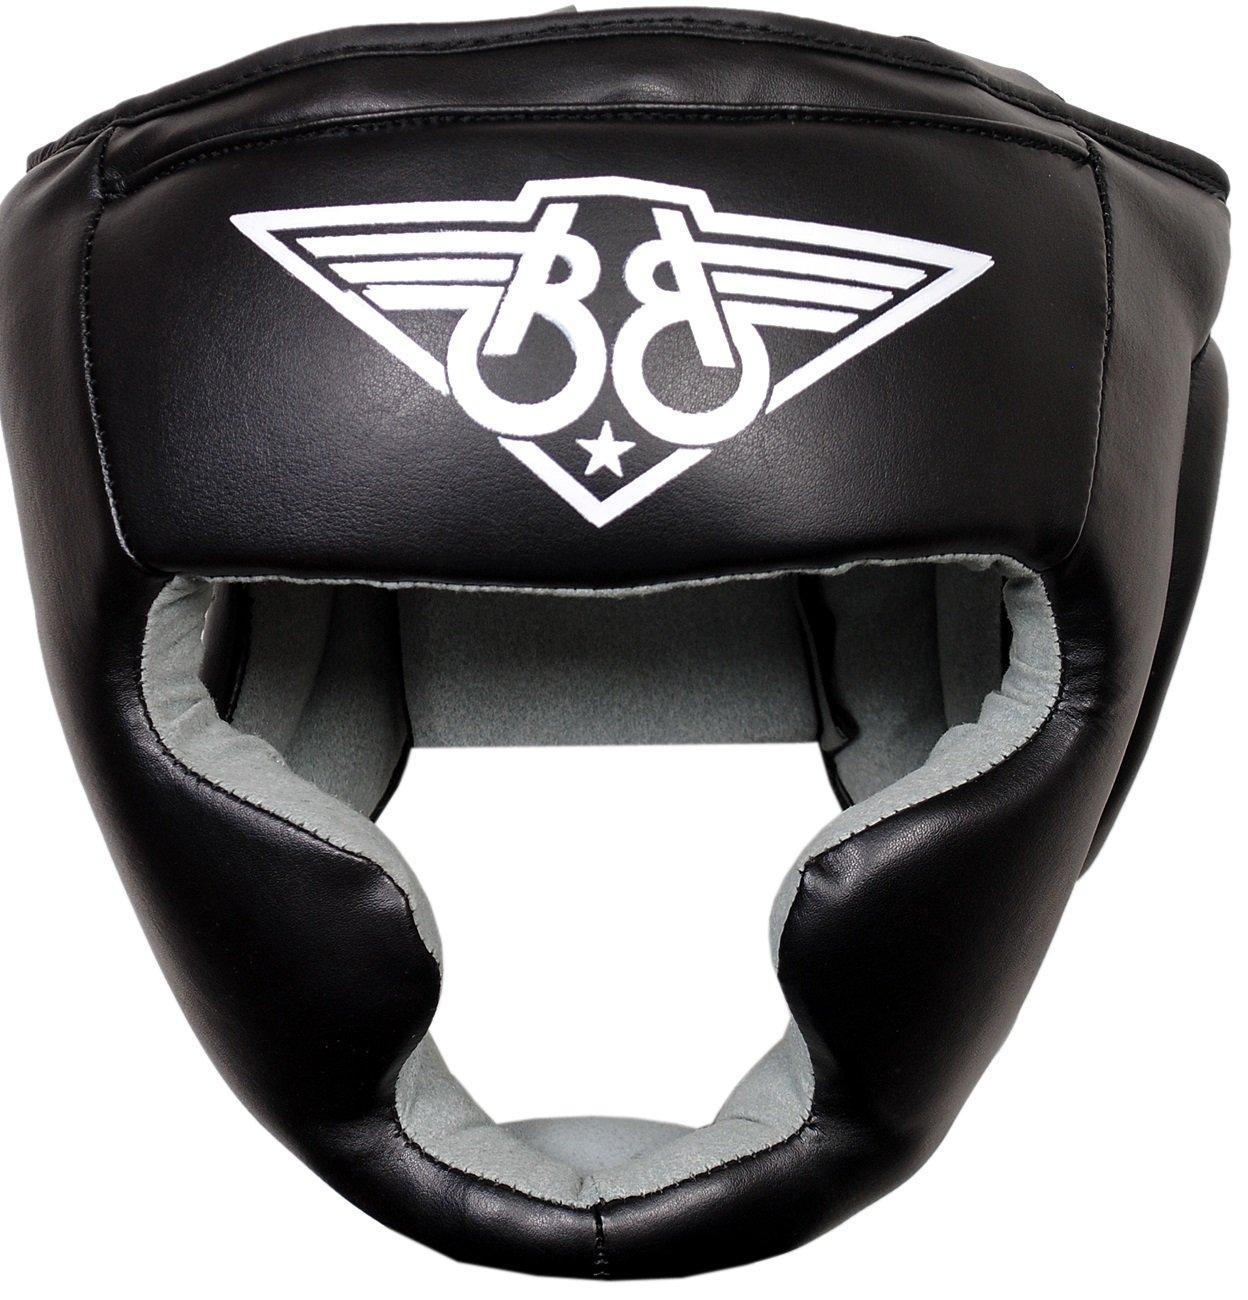 Black TINKSKY Boxing Helmet Closed Type Boxing Head Guard Muay Thai Kick Brace Head Protection for Free Combat Taekwondo